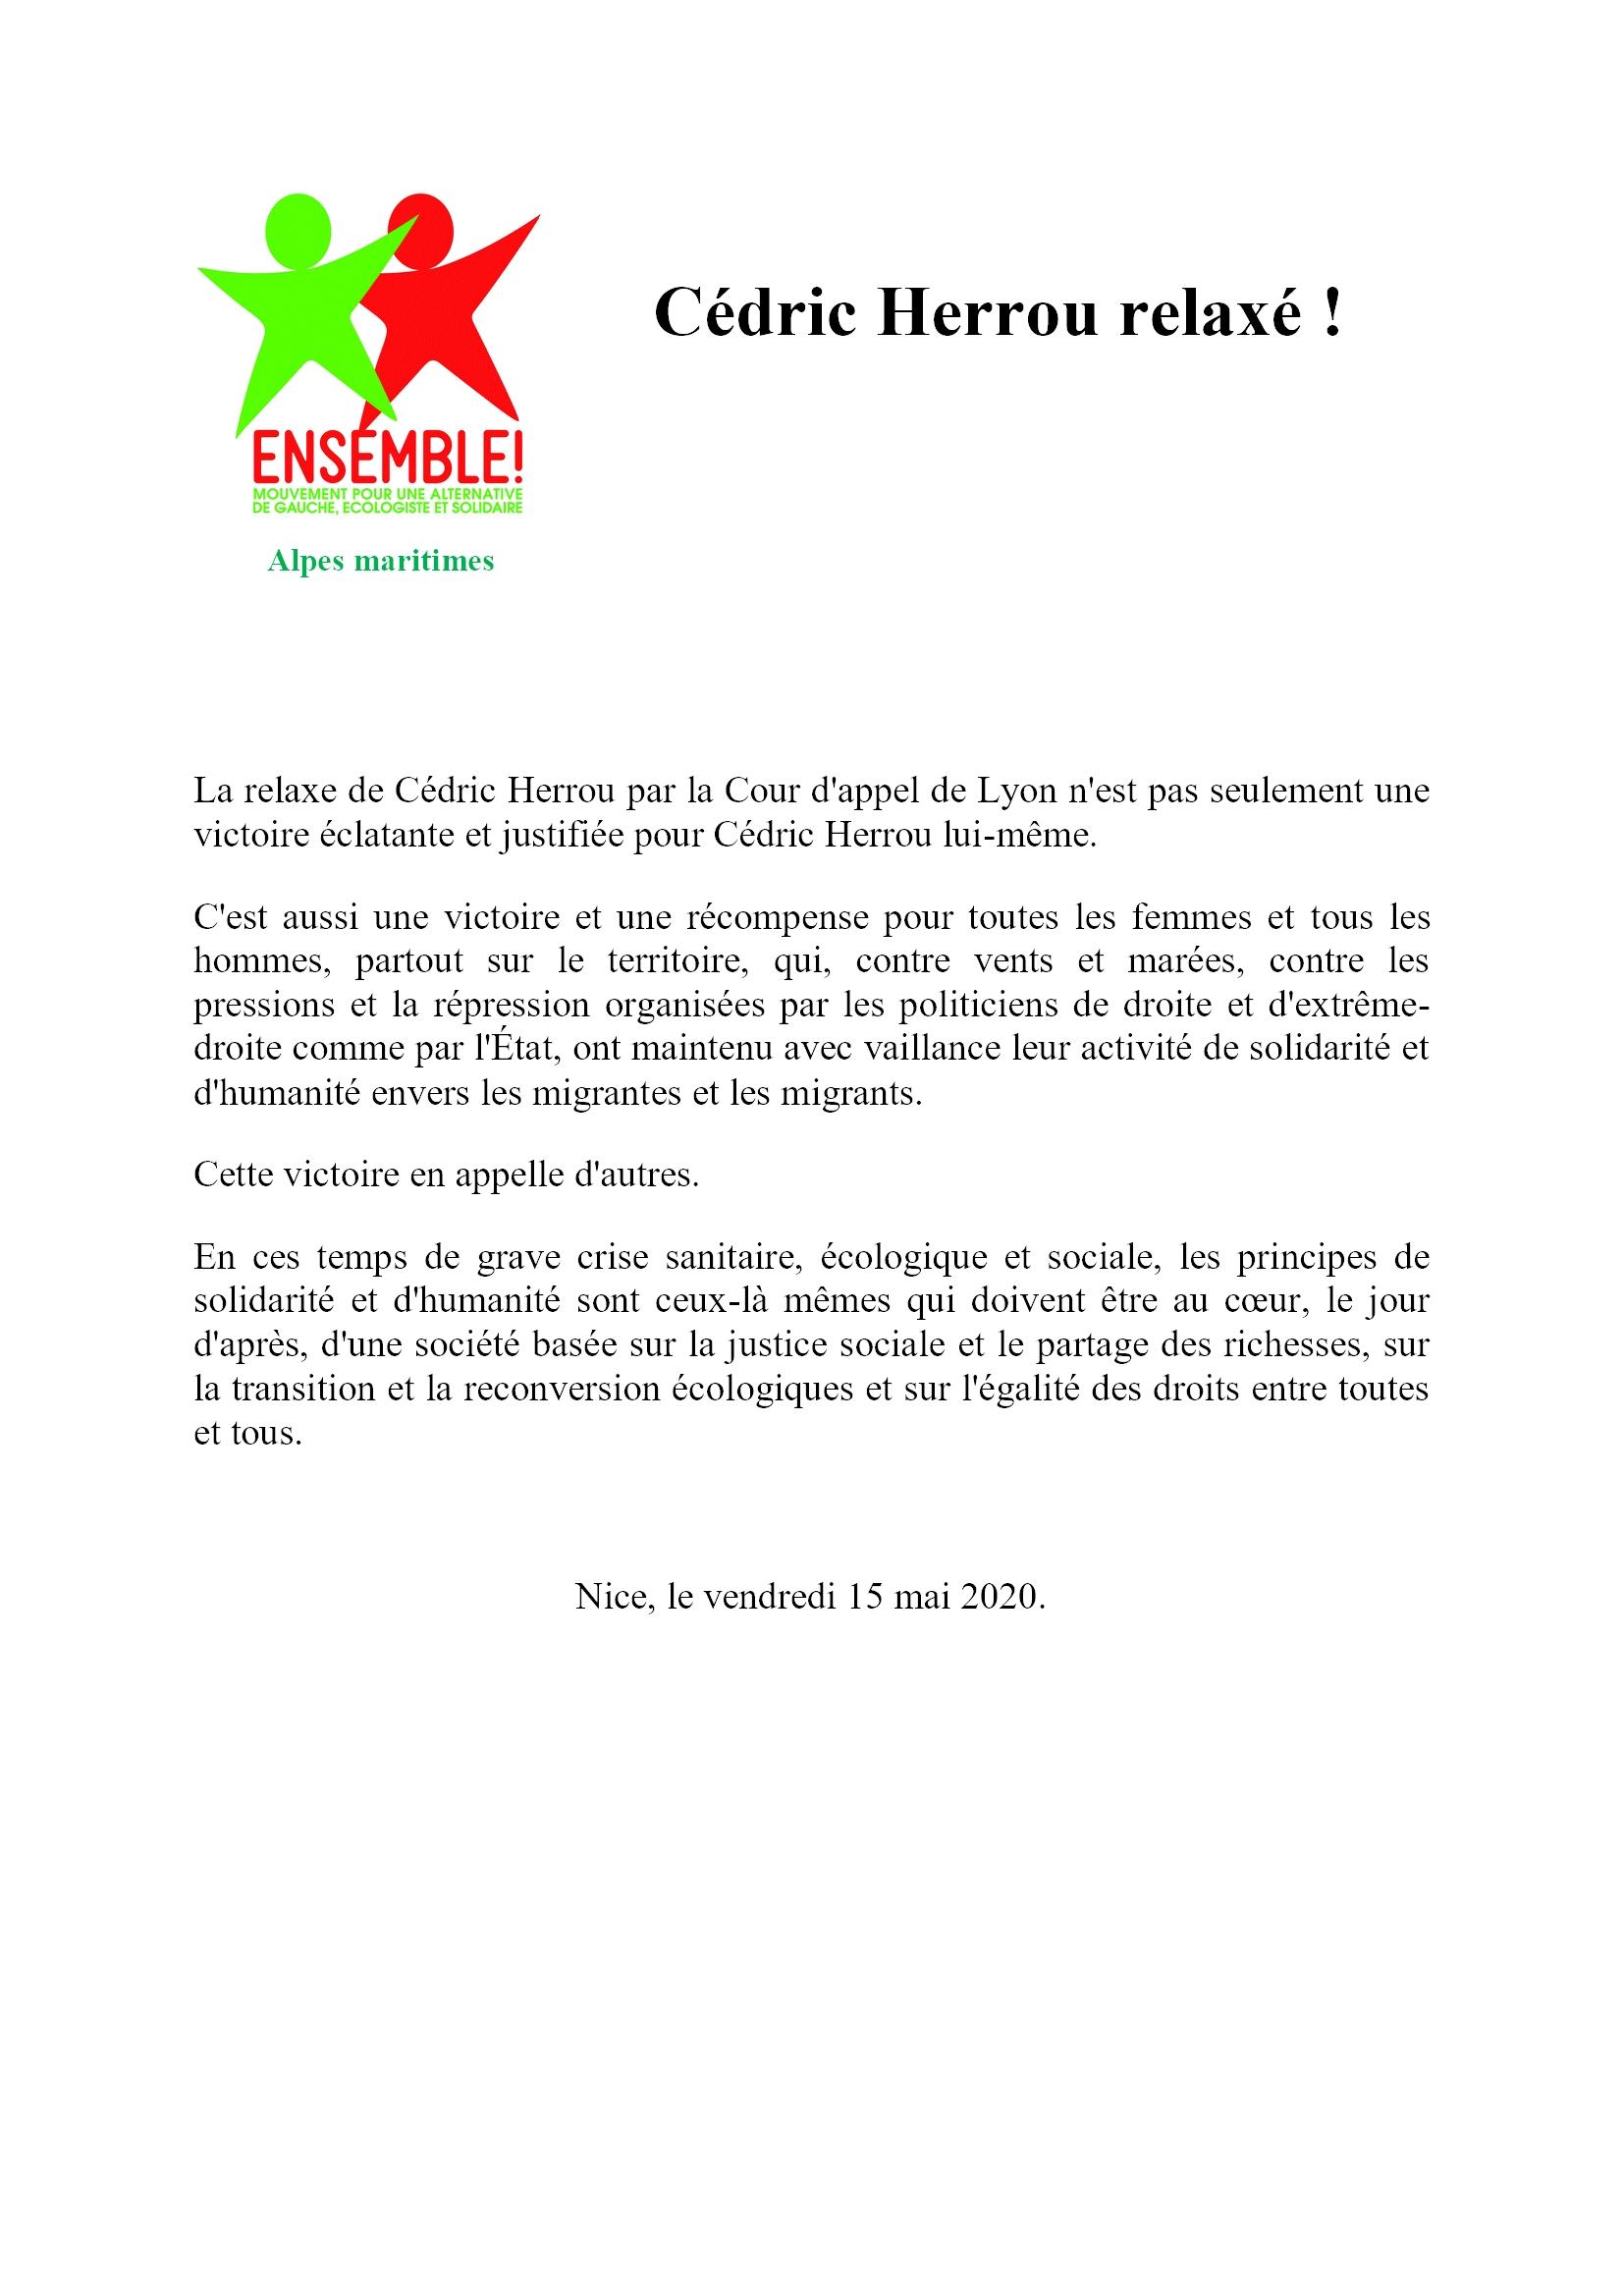 ComPress Ensemble-06 15-05-2020 Cédric Herrou relaxé